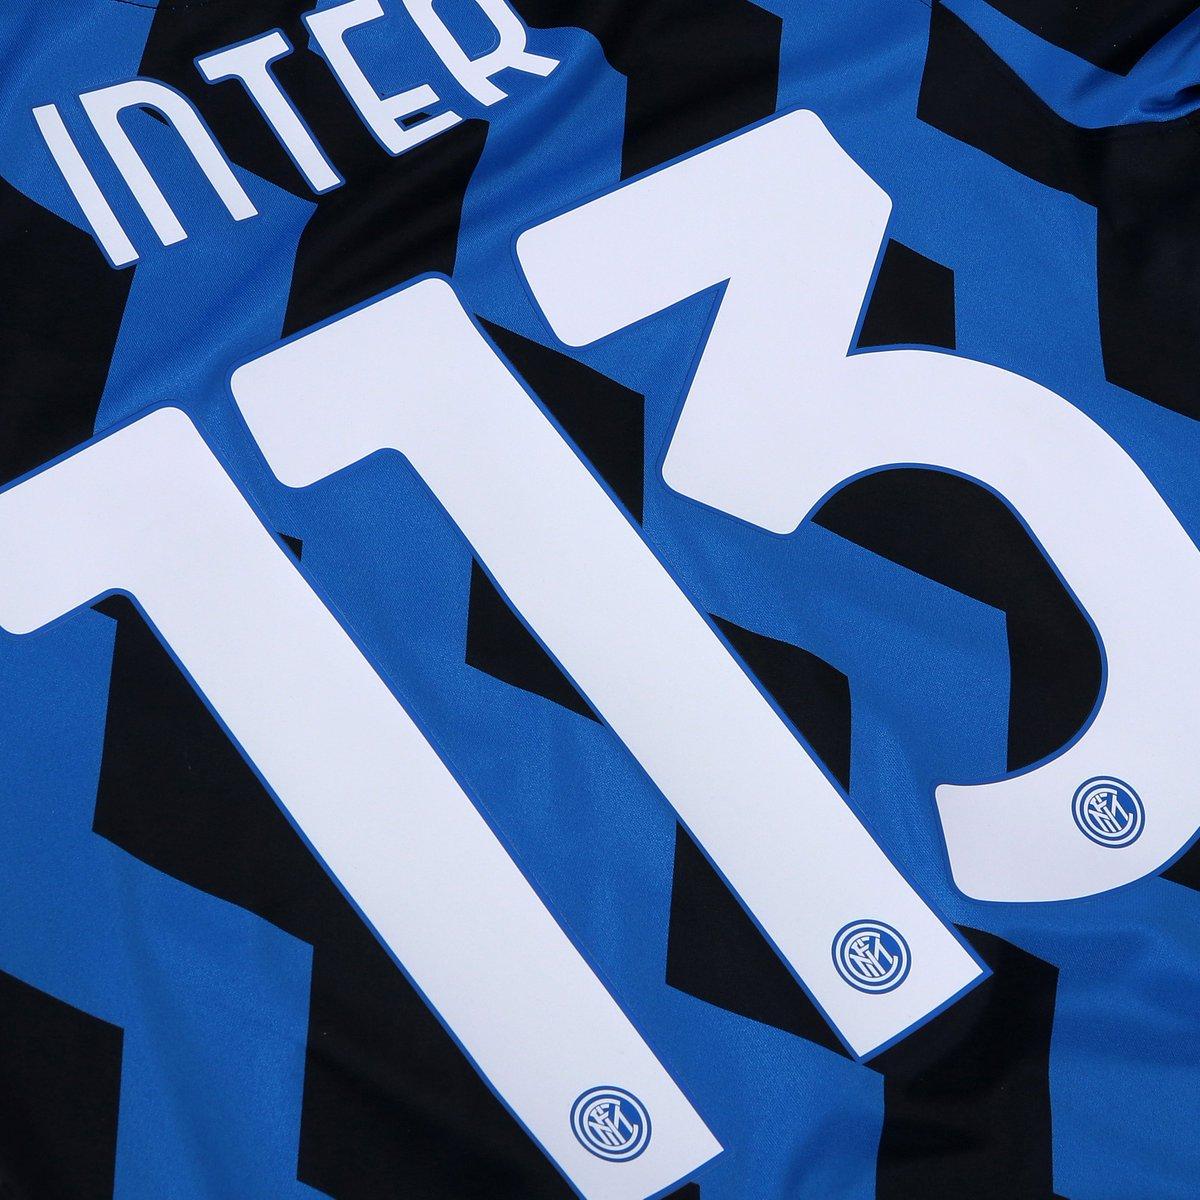 #Inter113